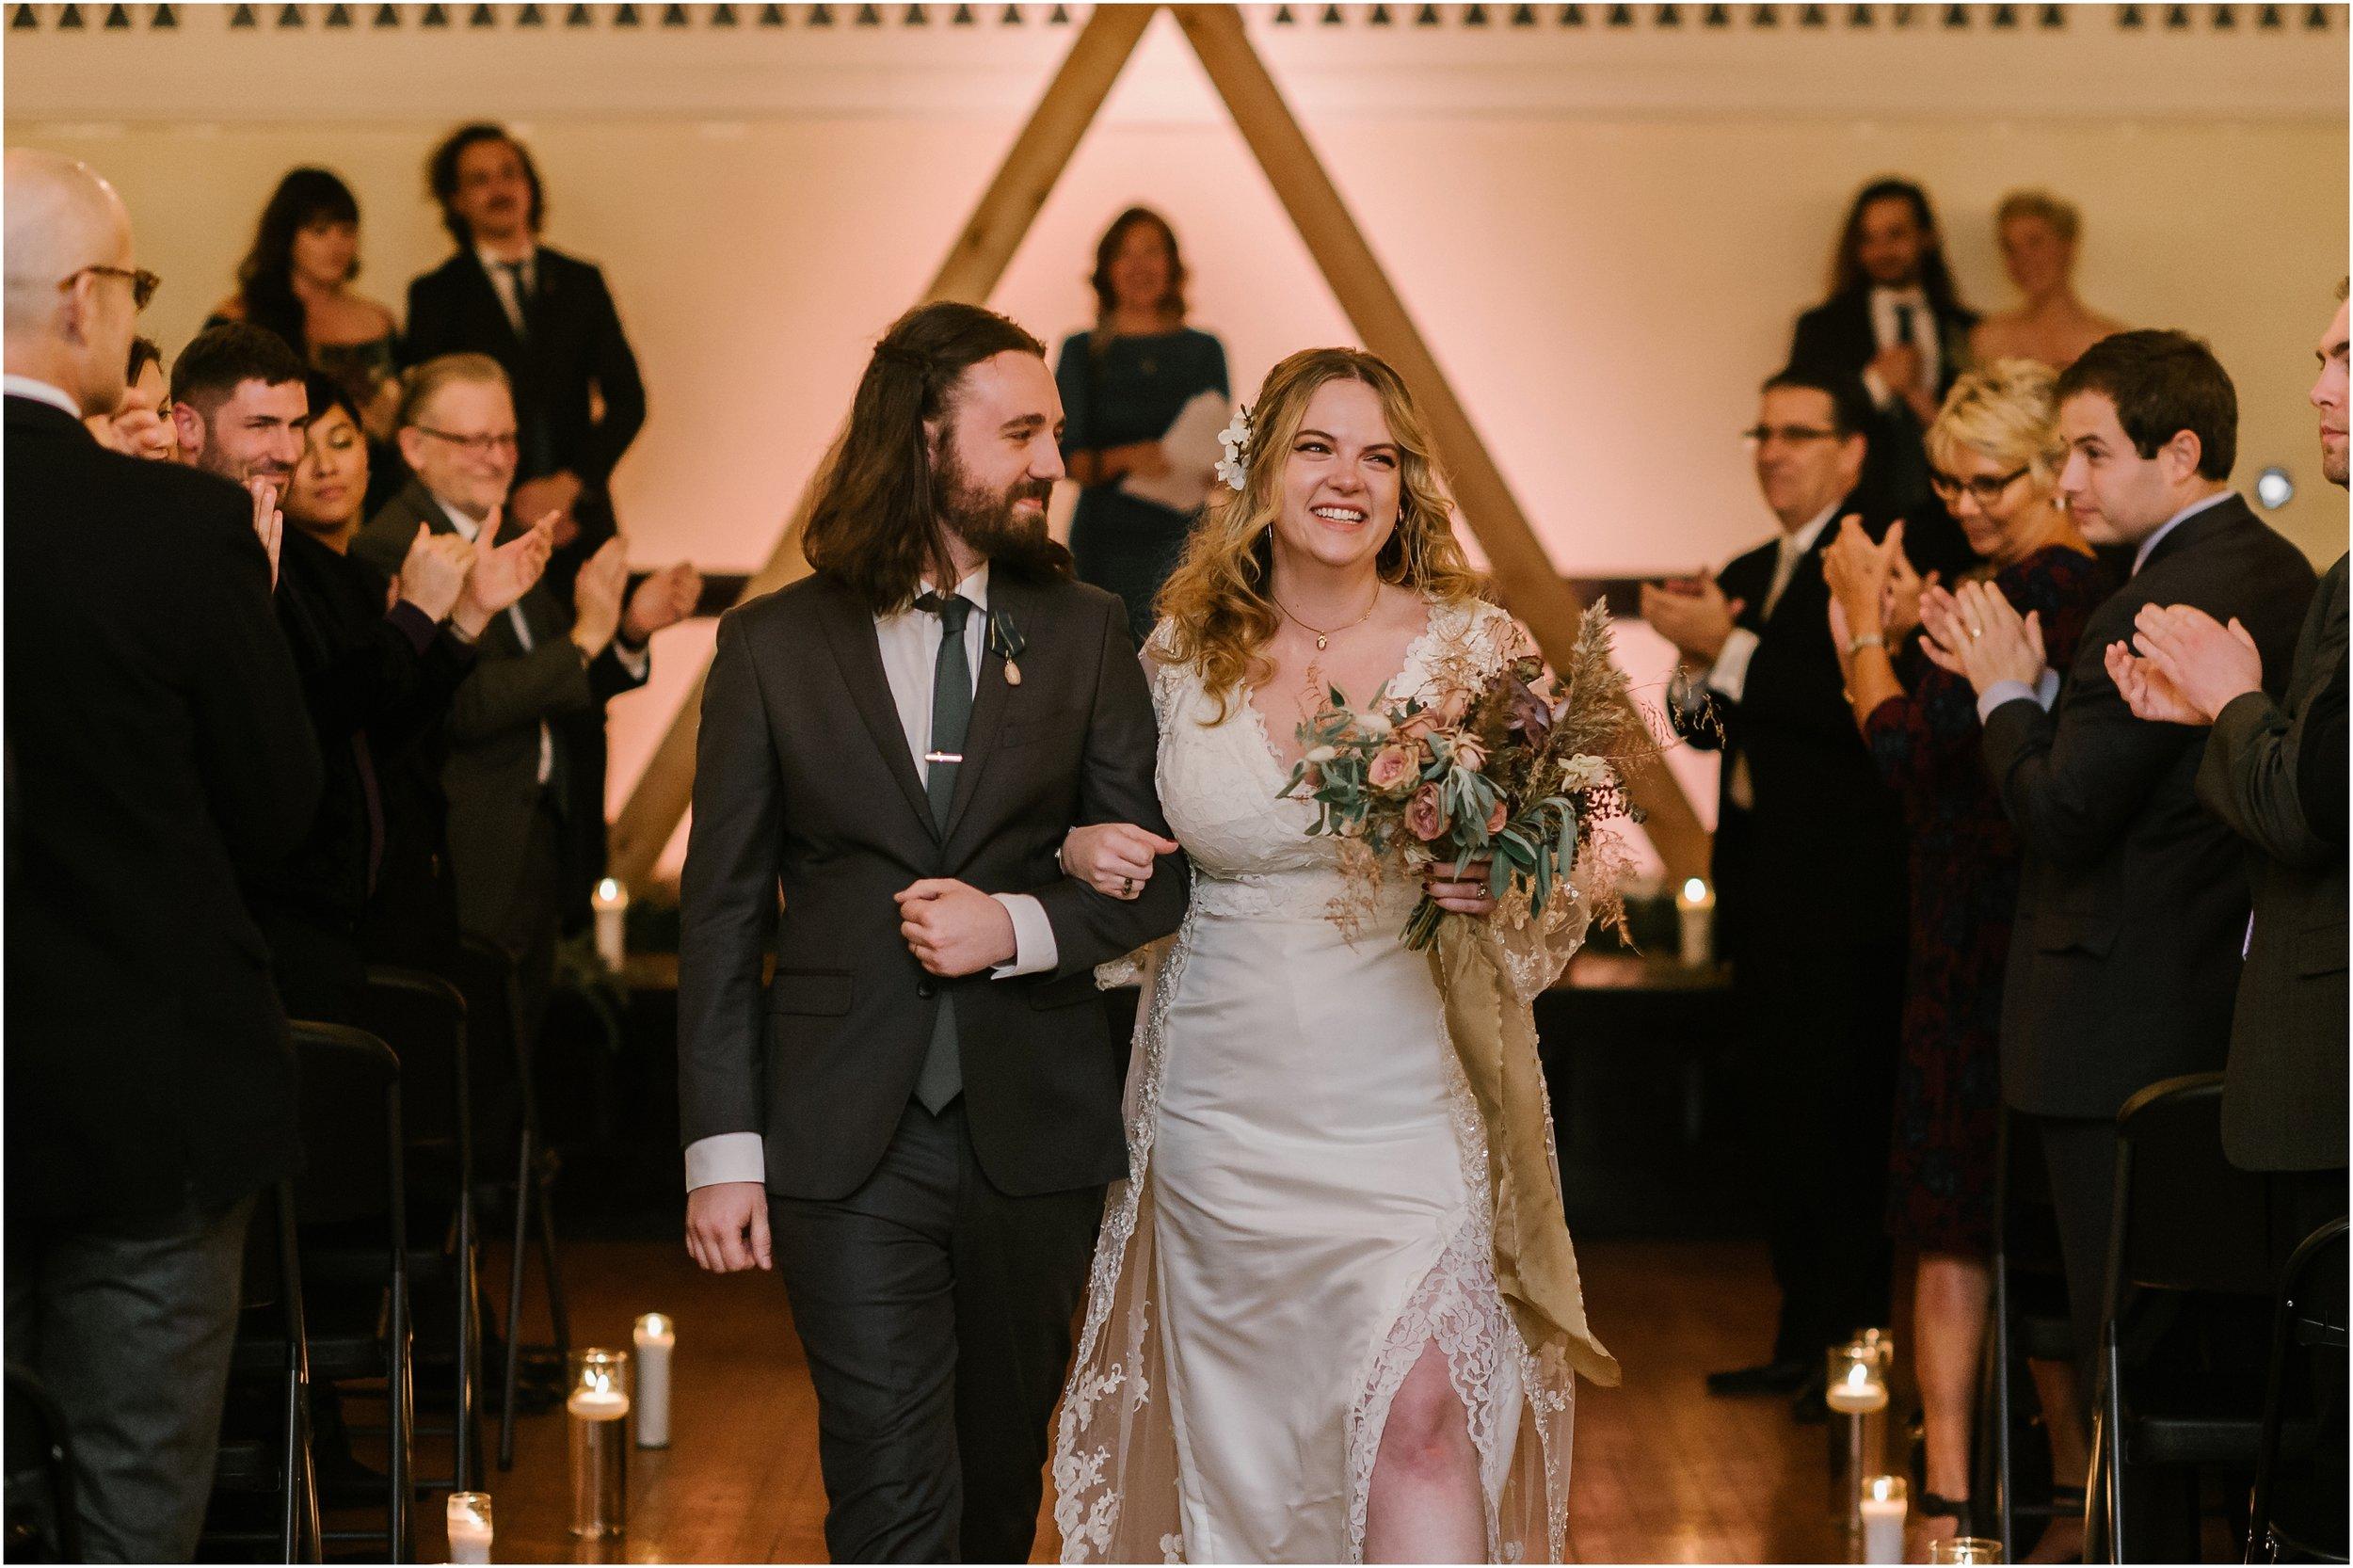 Rebecca_Shehorn_Photography_Indianapolis_Wedding_Photographer_9467.jpg